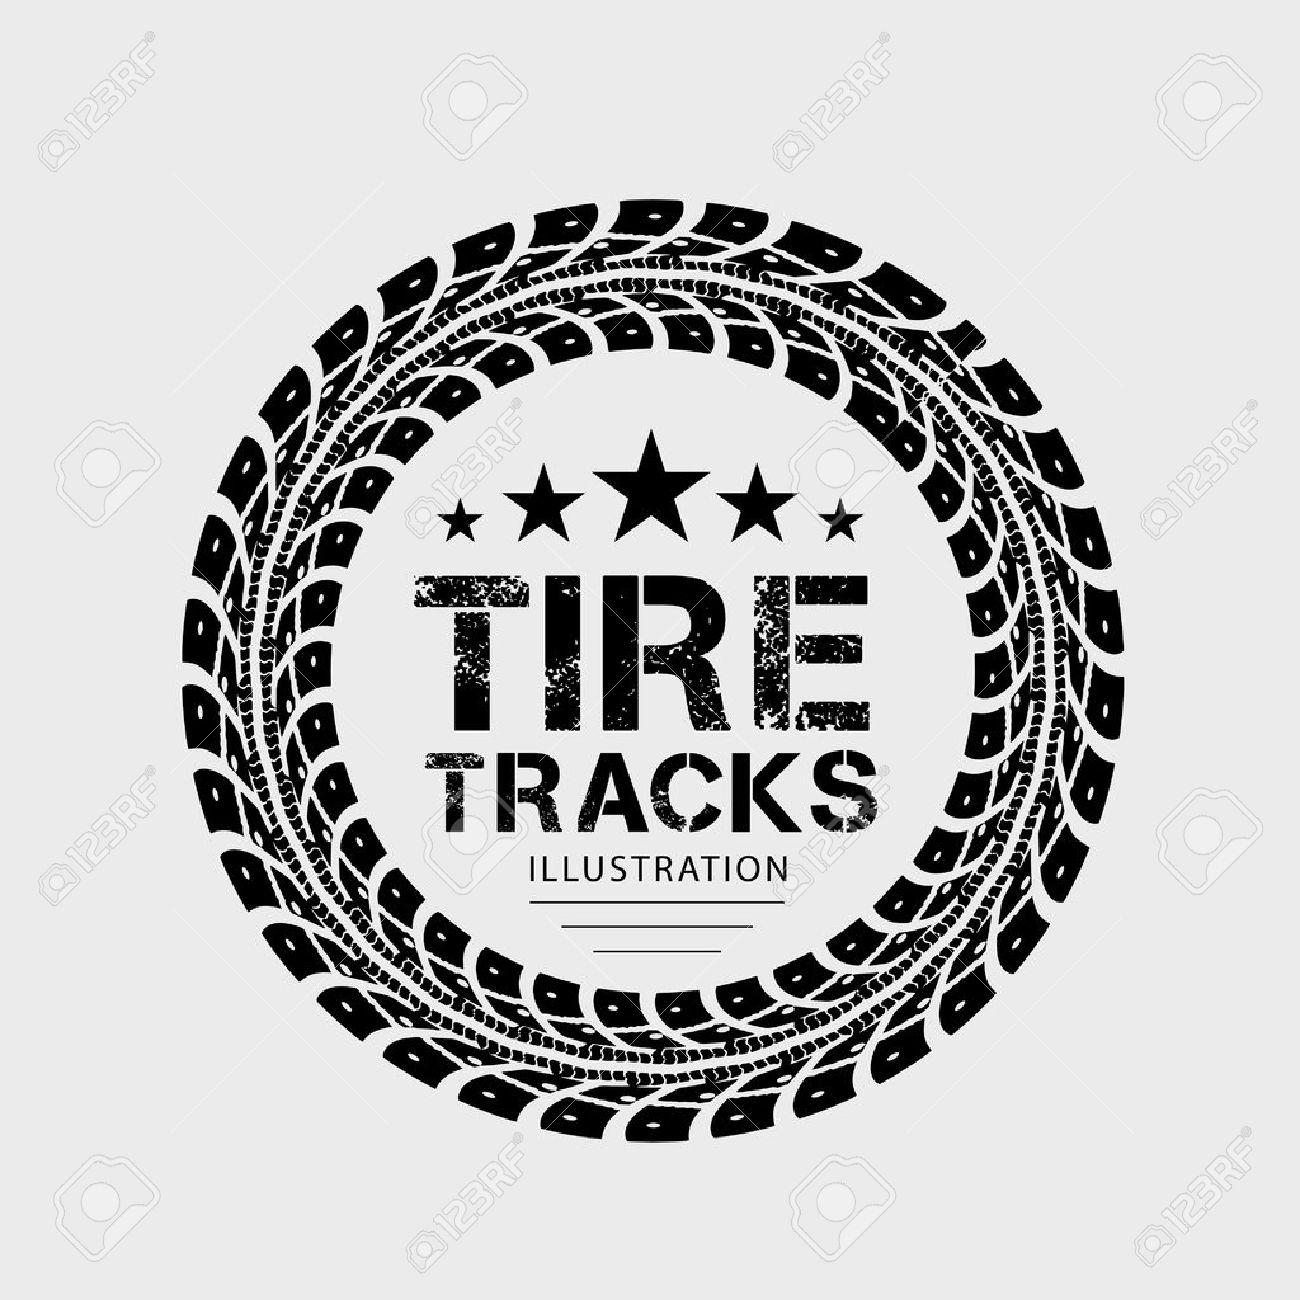 Tire tracks Illustration on grey background - 30450935